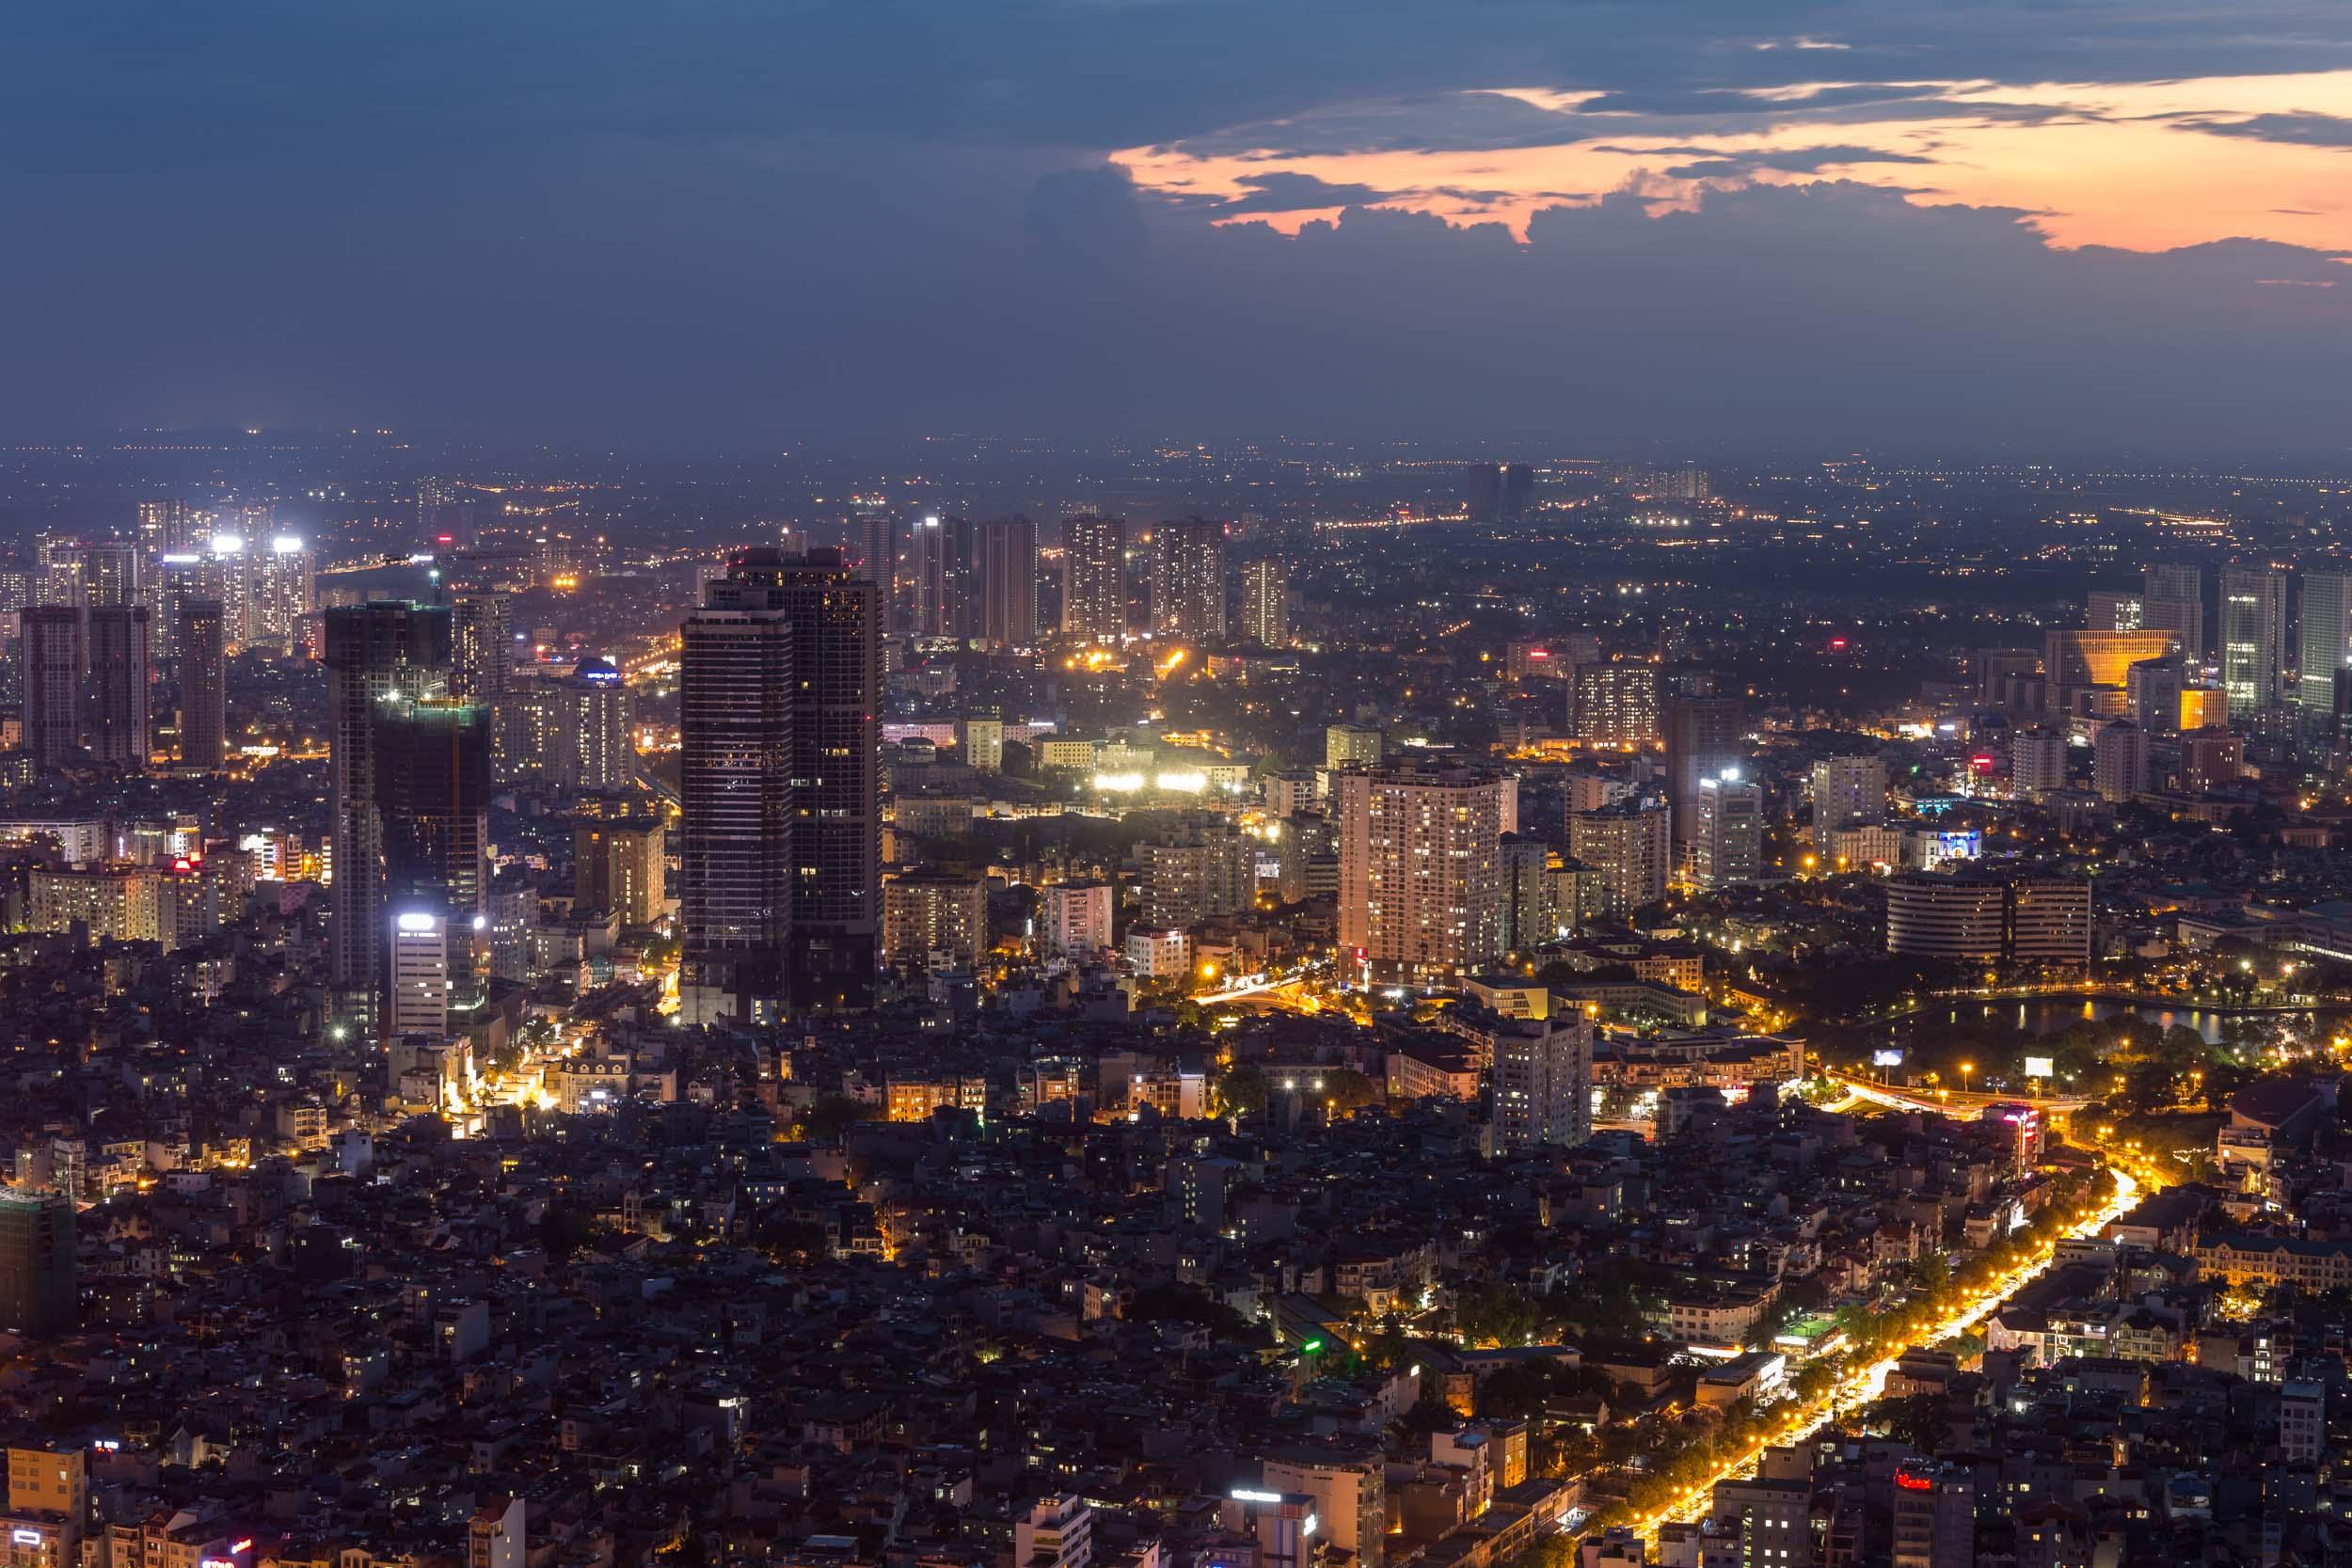 Night shot of Hanoi city scape.